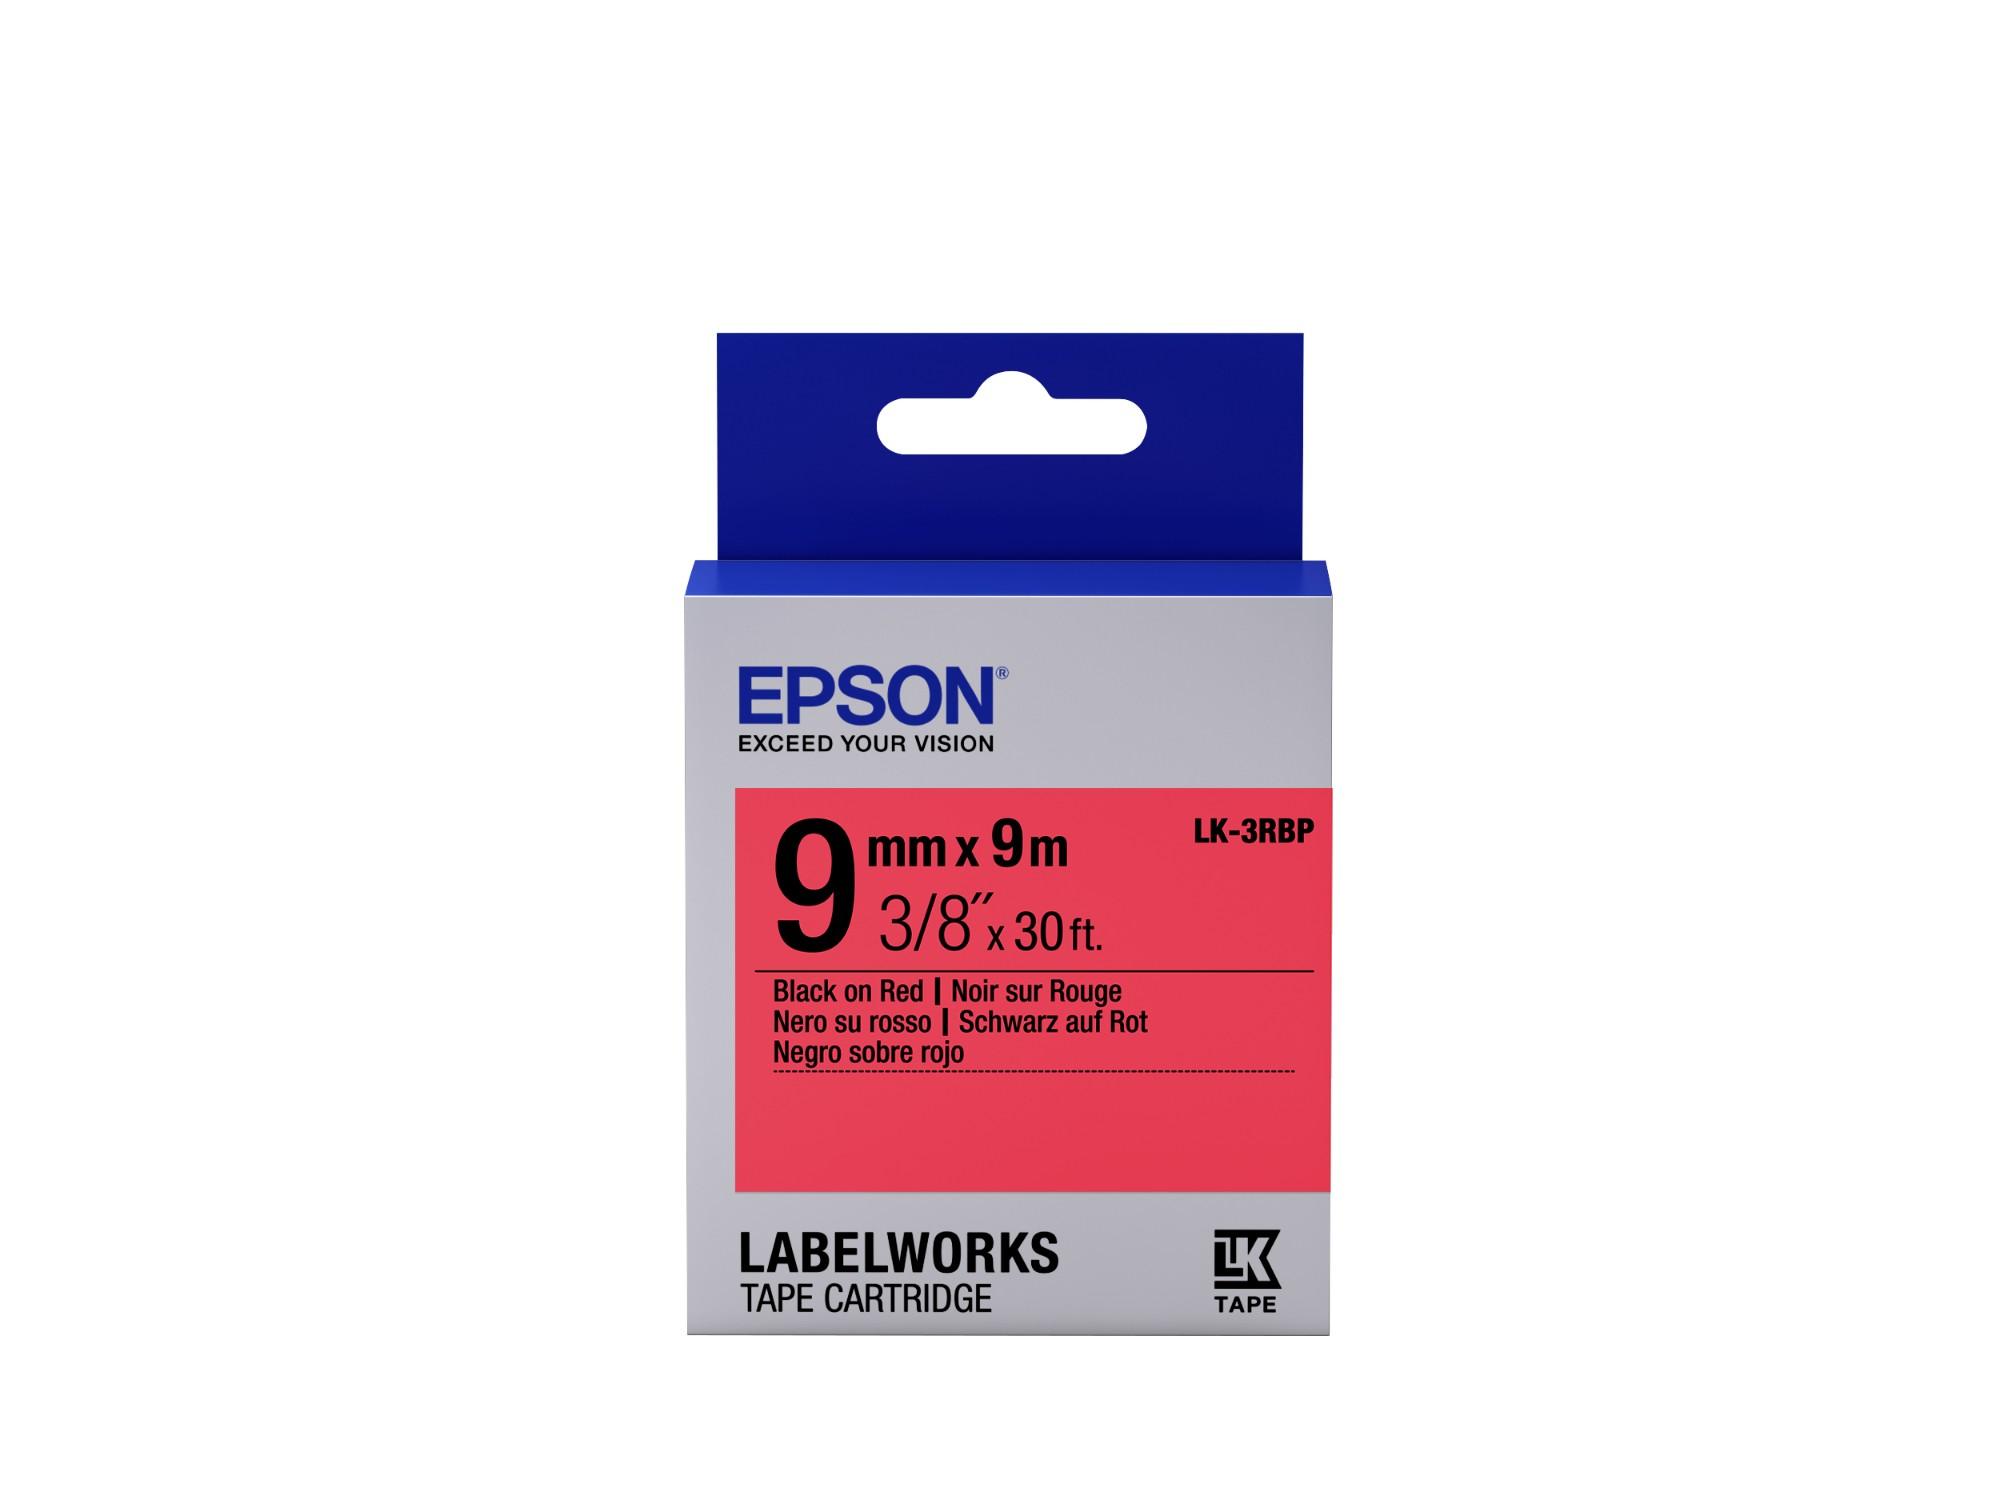 Epson Pastel Tape - LK-3RBP Pastel Blk/Red 9/9